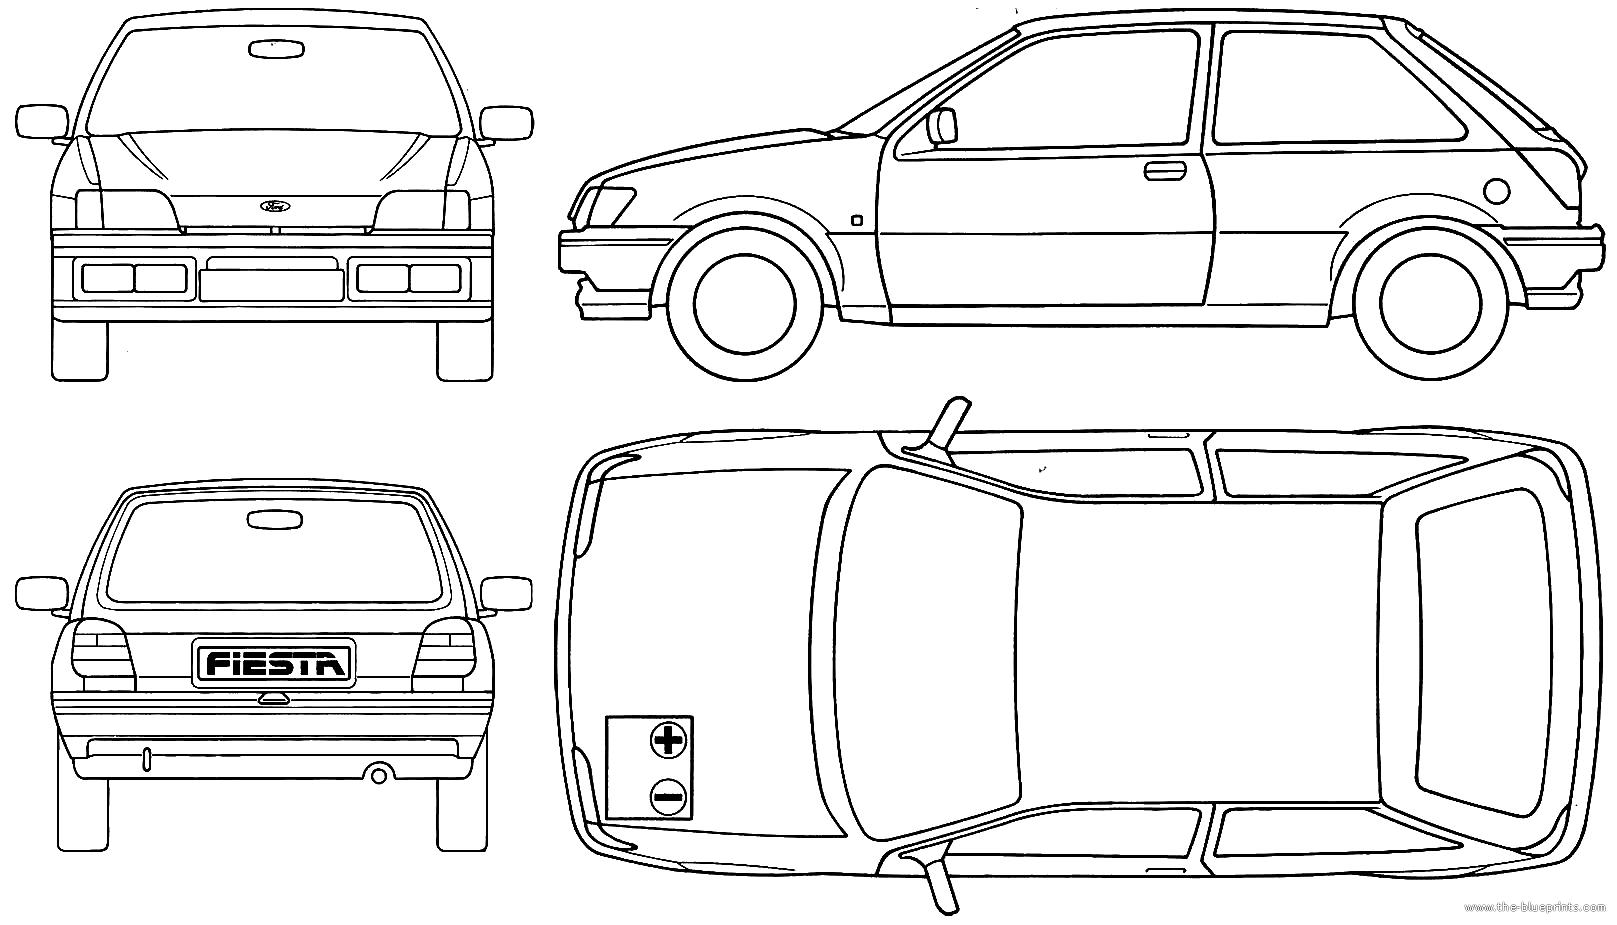 Blueprints > Cars > Ford > Ford Fiesta 3-Door (1990)